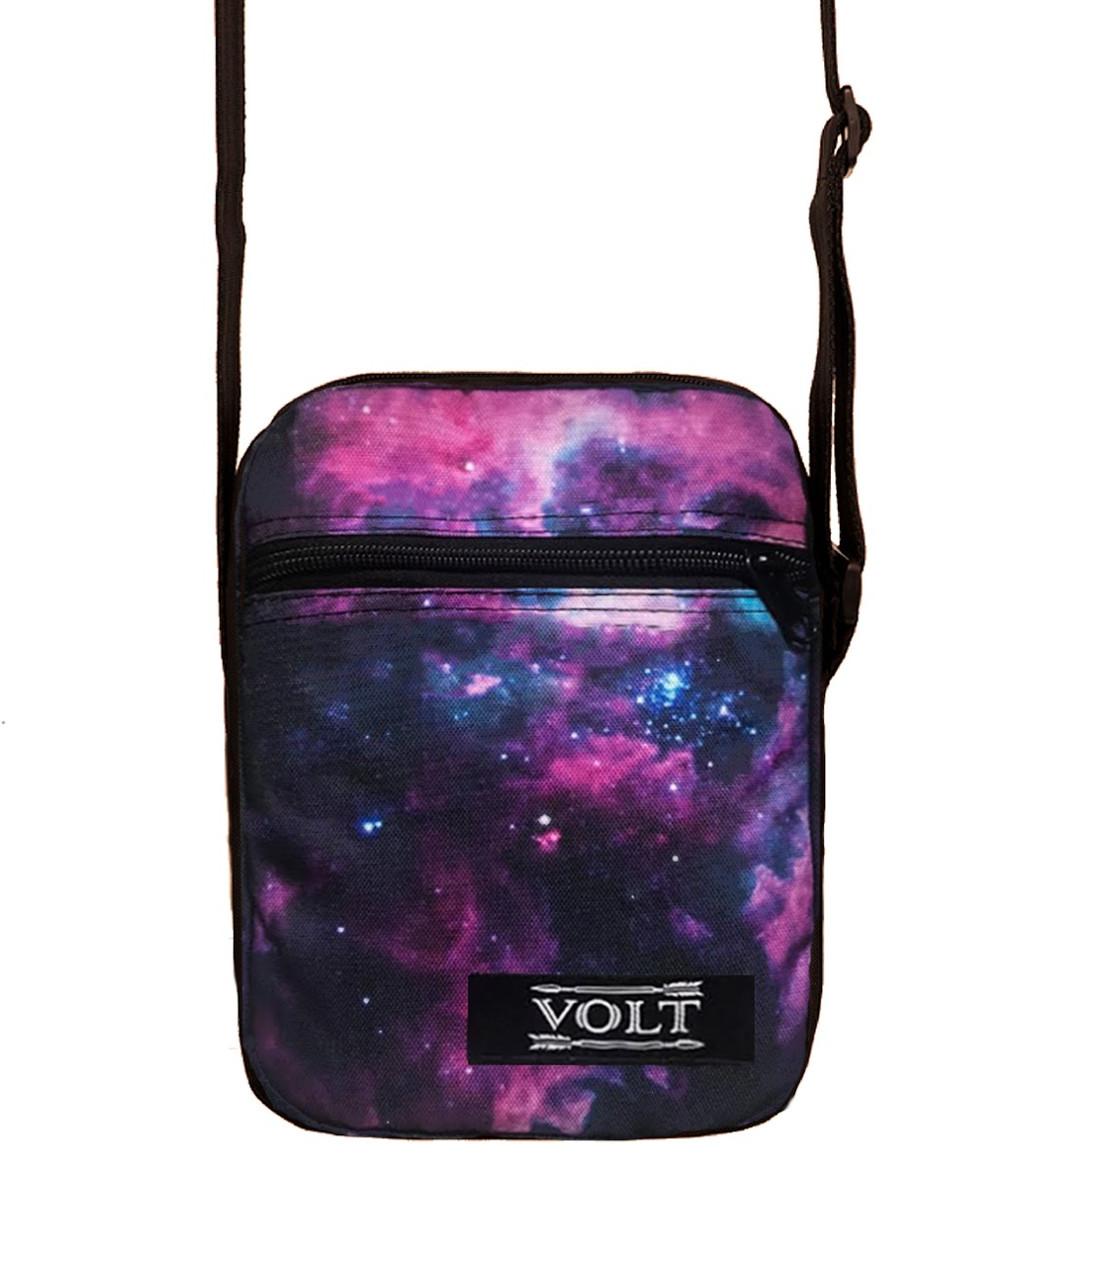 Месcенджер VOLT FP Cosmos